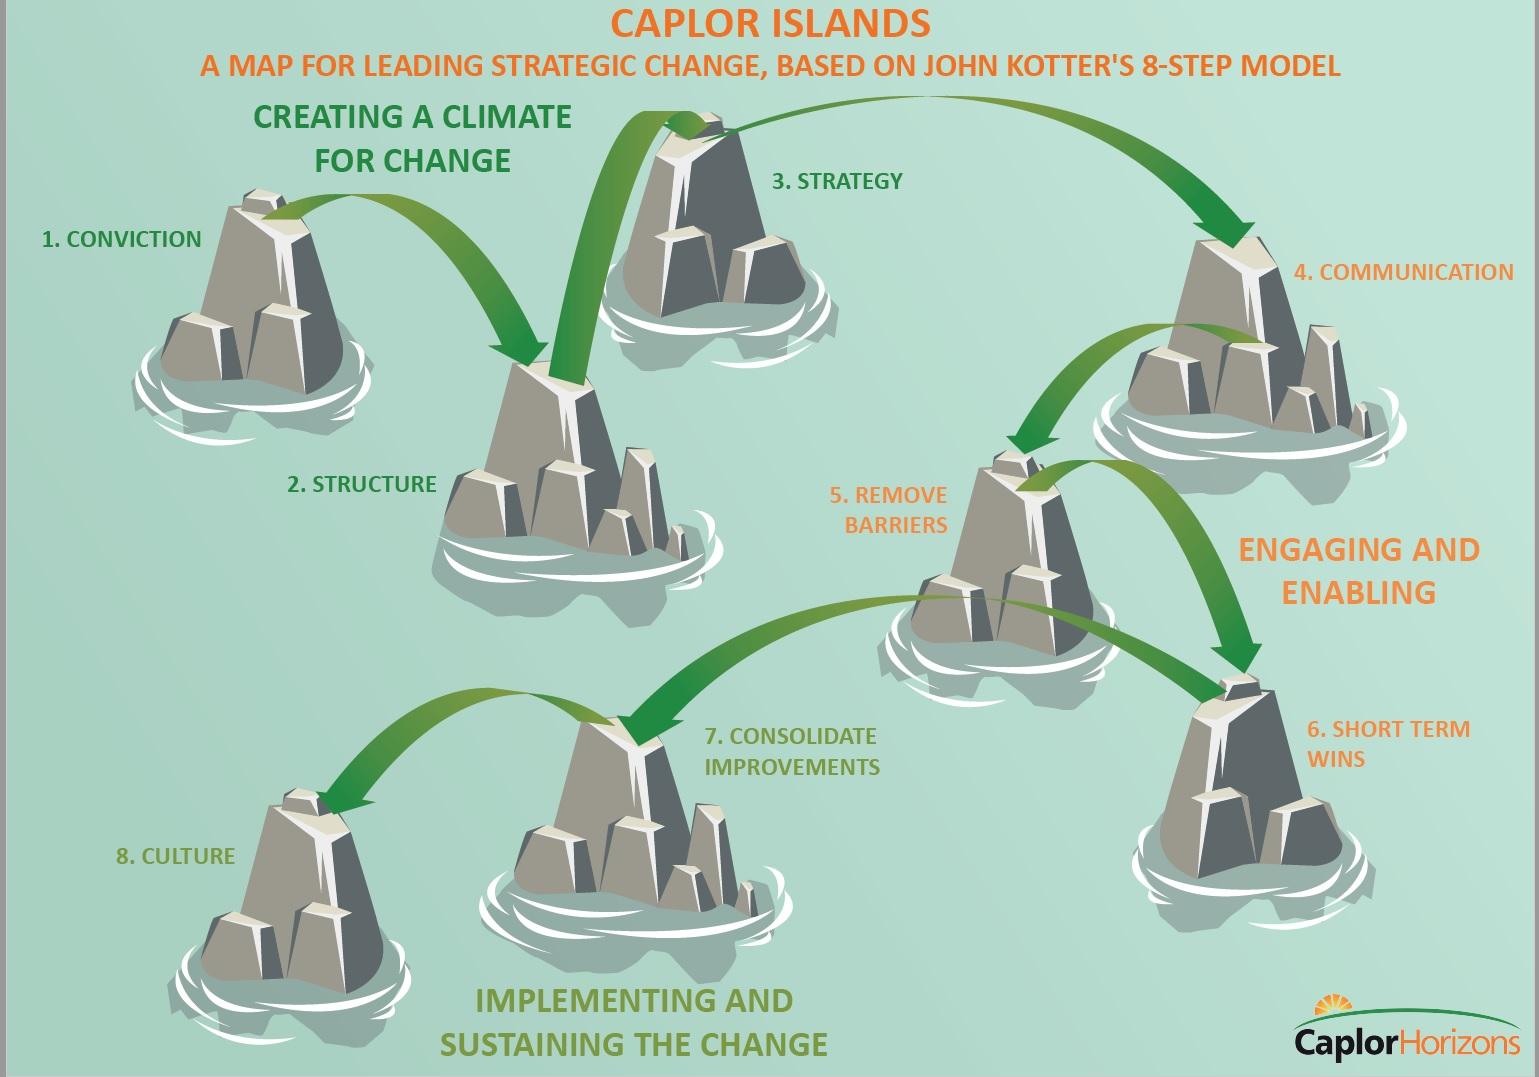 Caplor islands - The Caplor Islands is a model for leading strategic change inspired by John Kotter's 8-step model.